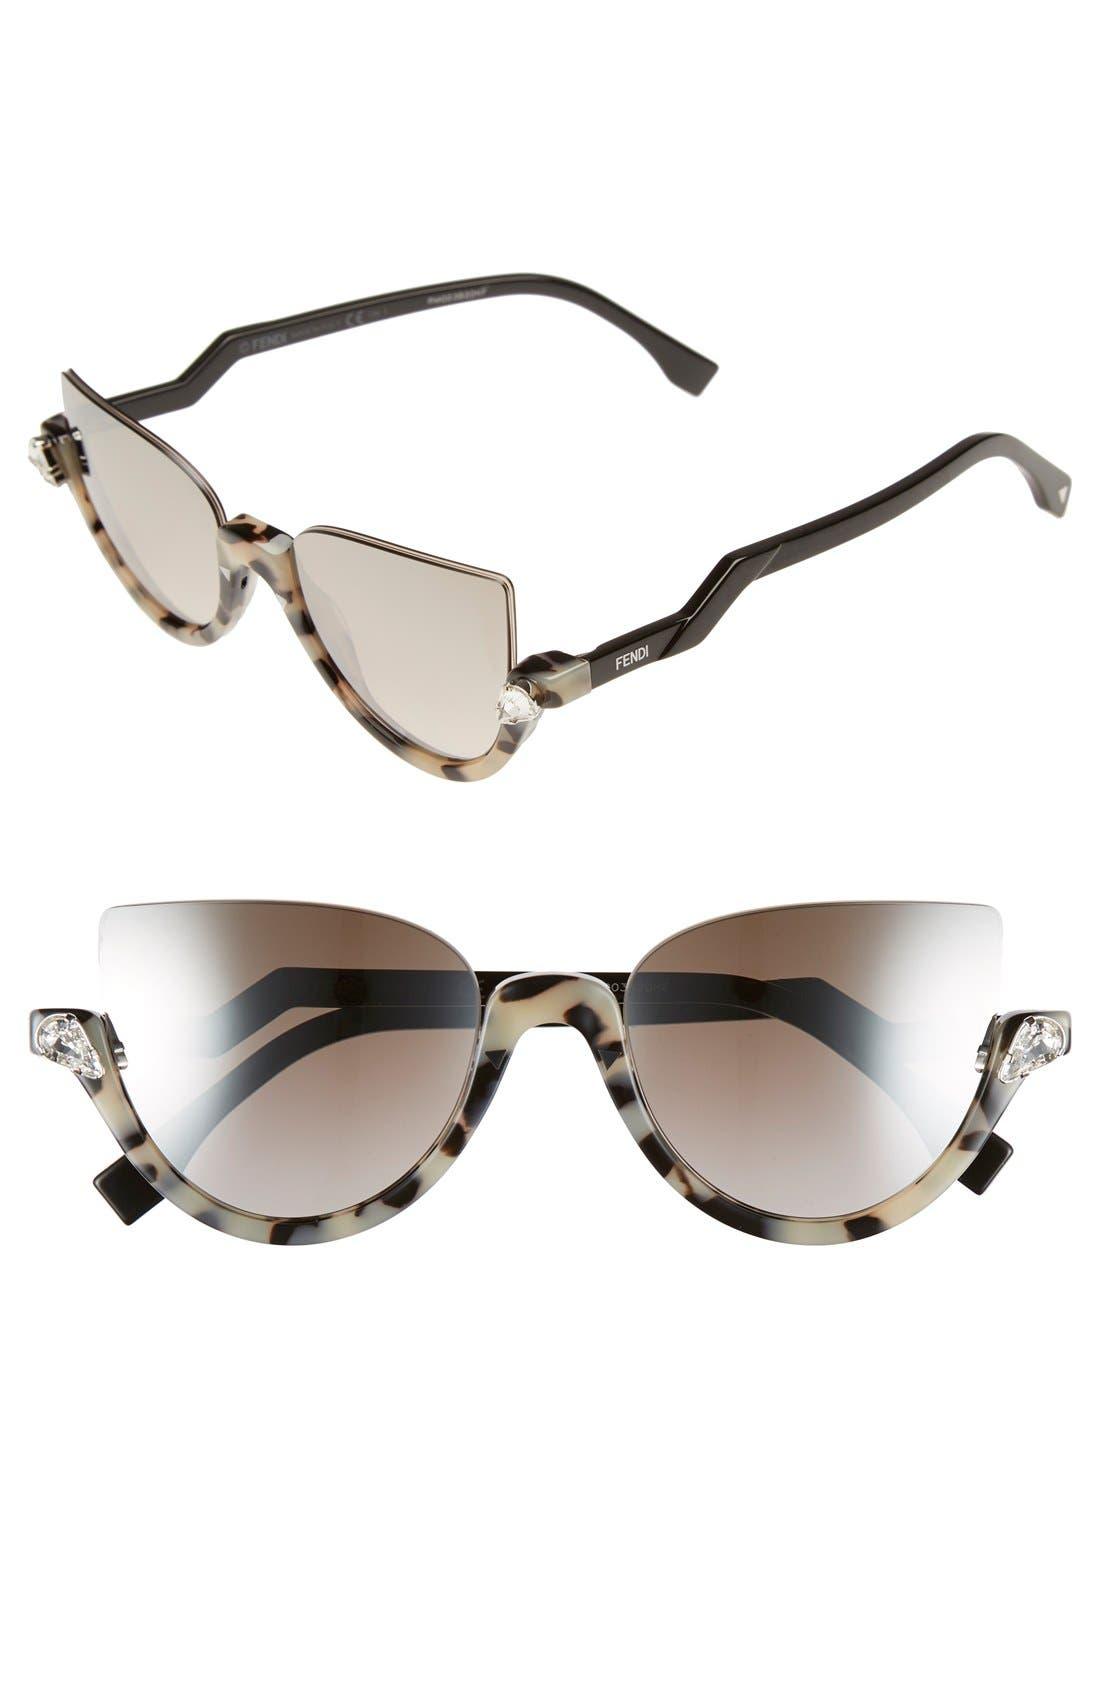 52mm Sunglasses,                         Main,                         color, Havana/ Shiny Black